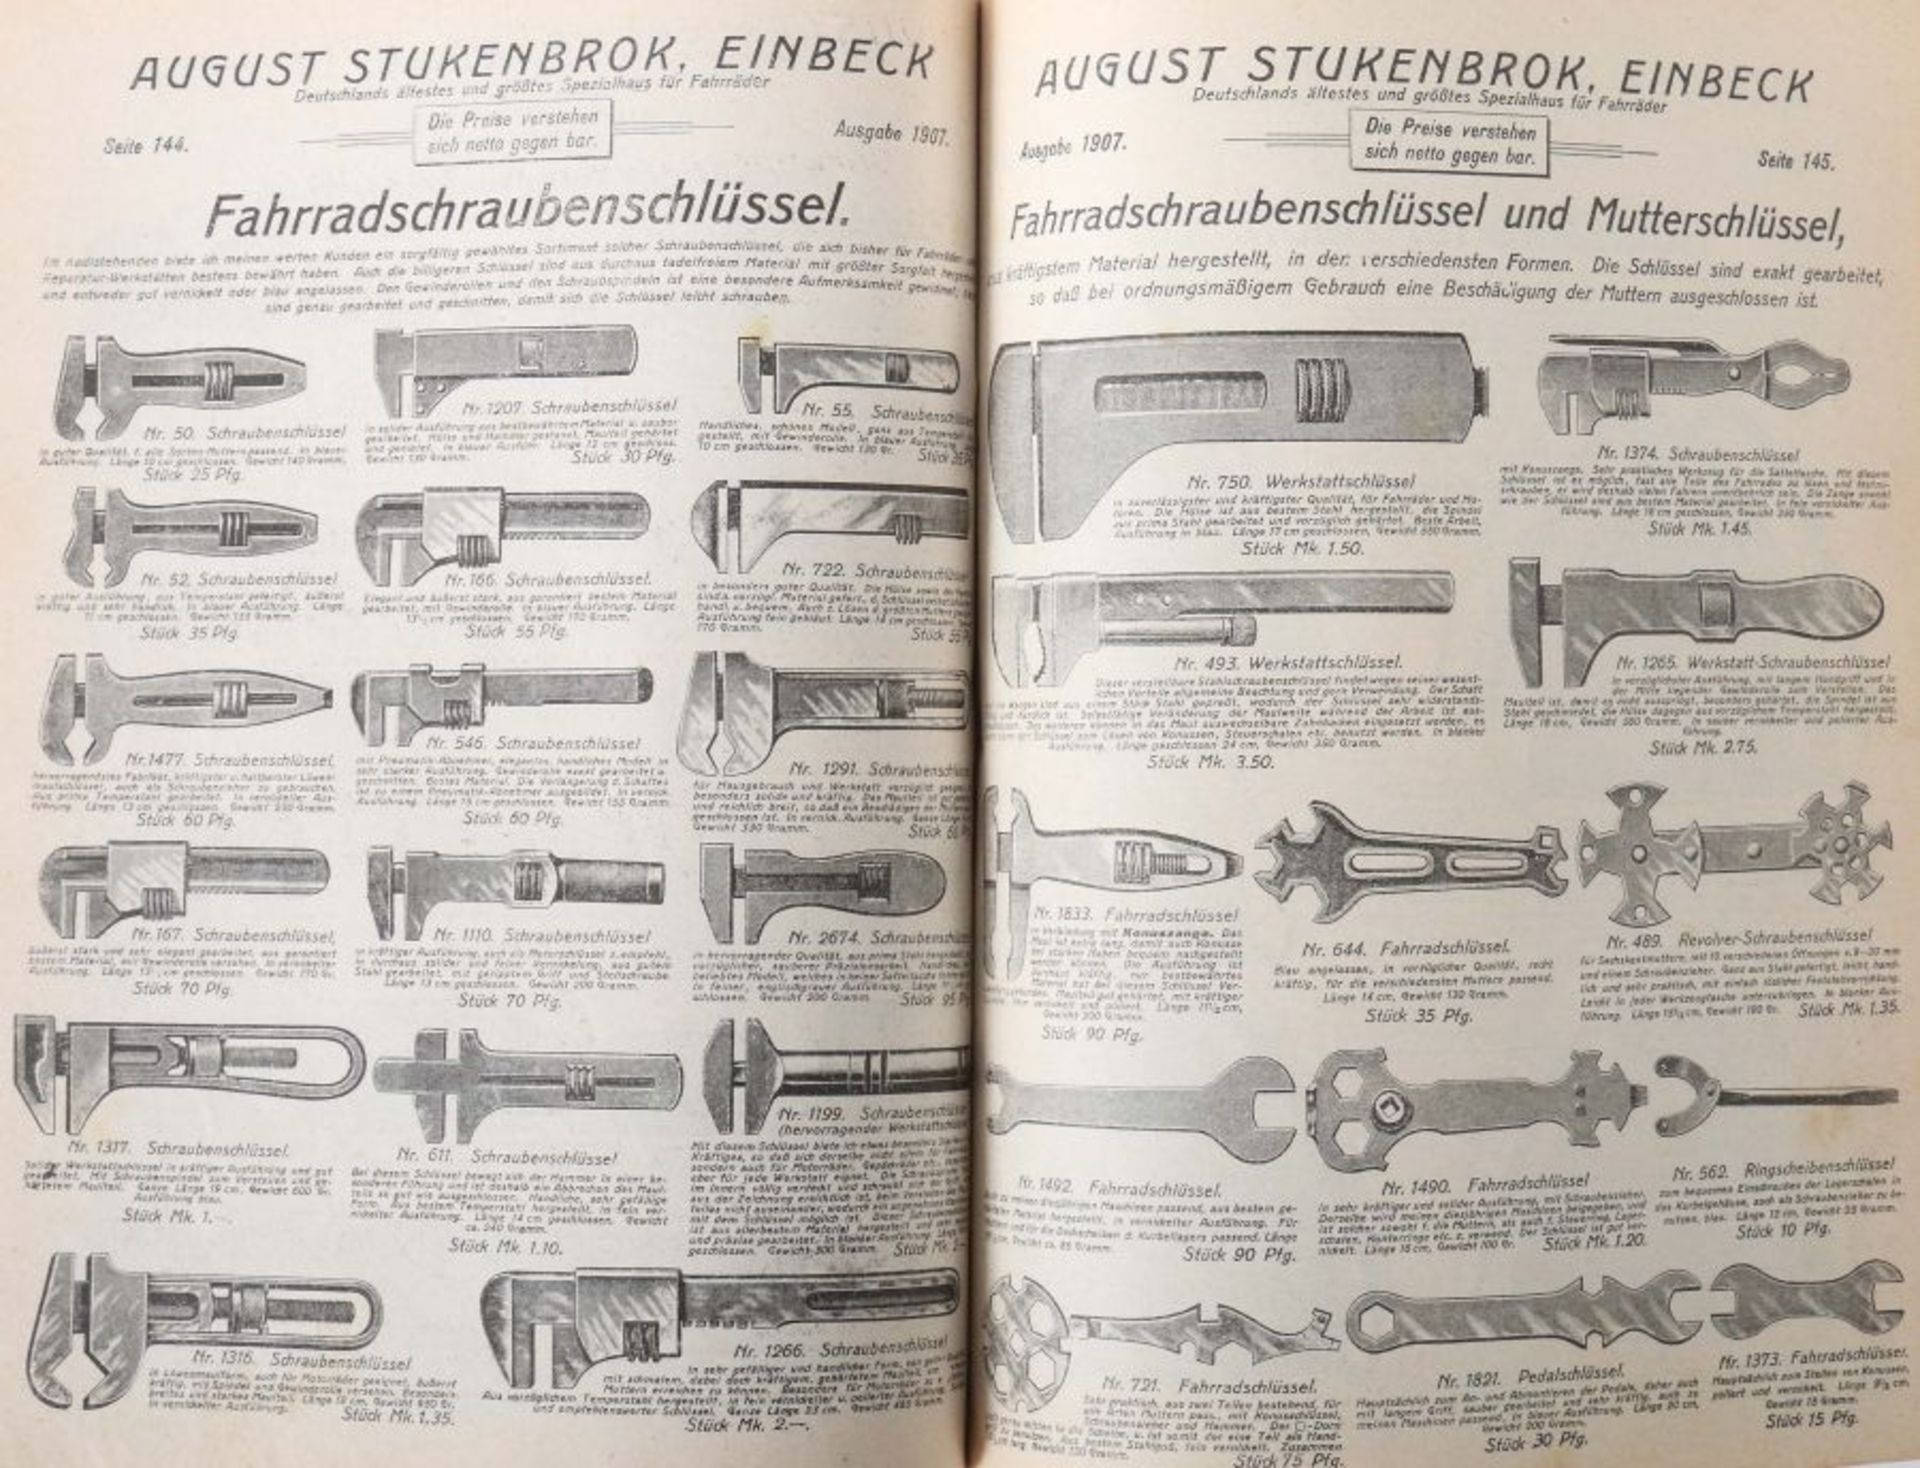 Warenkatalog August Stukenbrok, Einbeck 1907, Katalog mit zahlr. Abb., u.a. Fahrräder, - Bild 3 aus 3